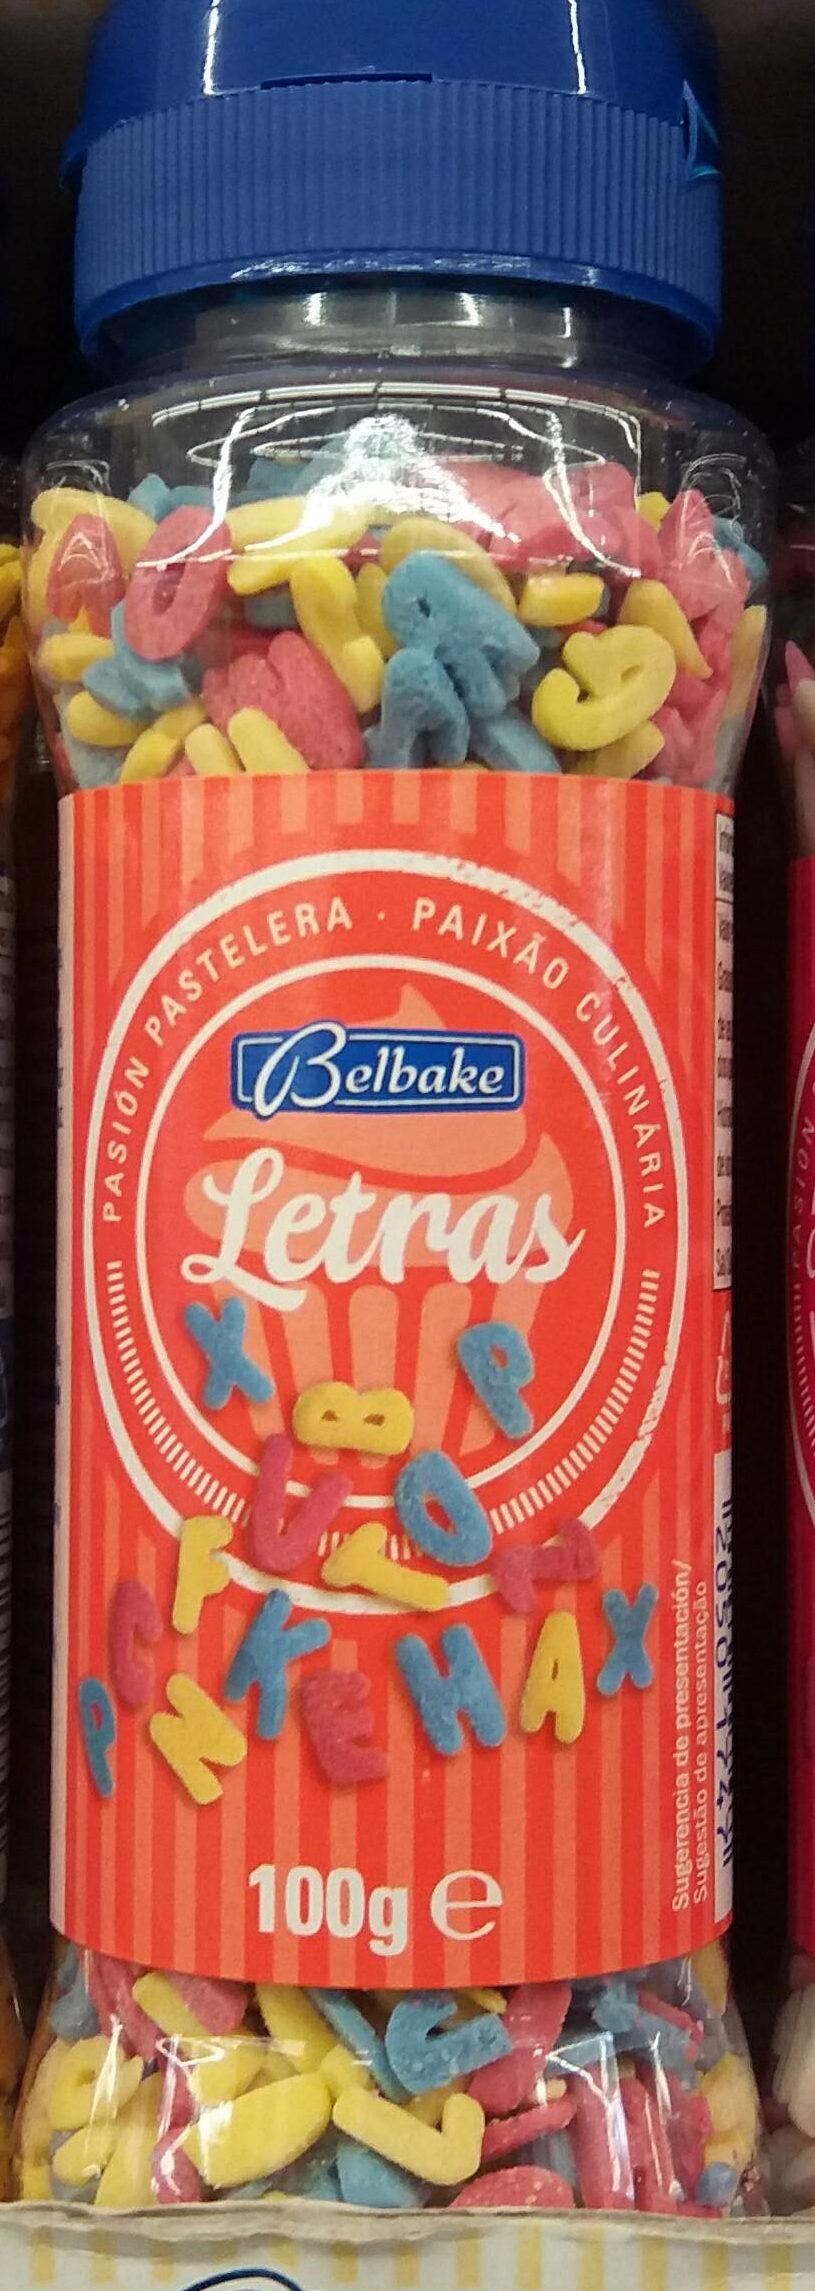 Kerst: Sugar Letters Busje 100 Gram (belbake) - Producto - es